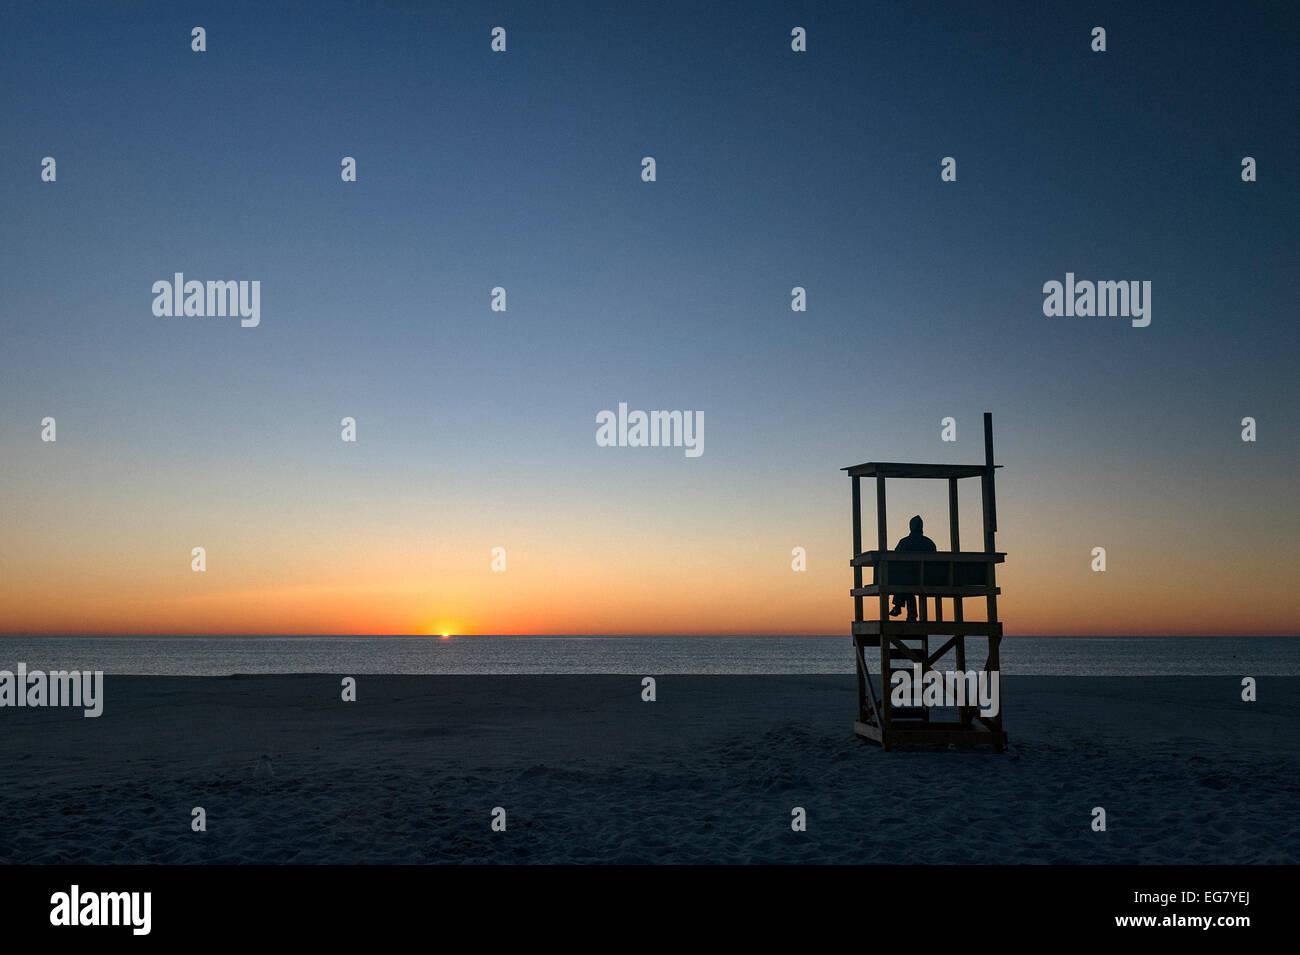 Person watches the sunrise over the ocean, Nauset Beach, Cape Cod National Seashore, Cape Cod, Massachusetts, USA - Stock Image